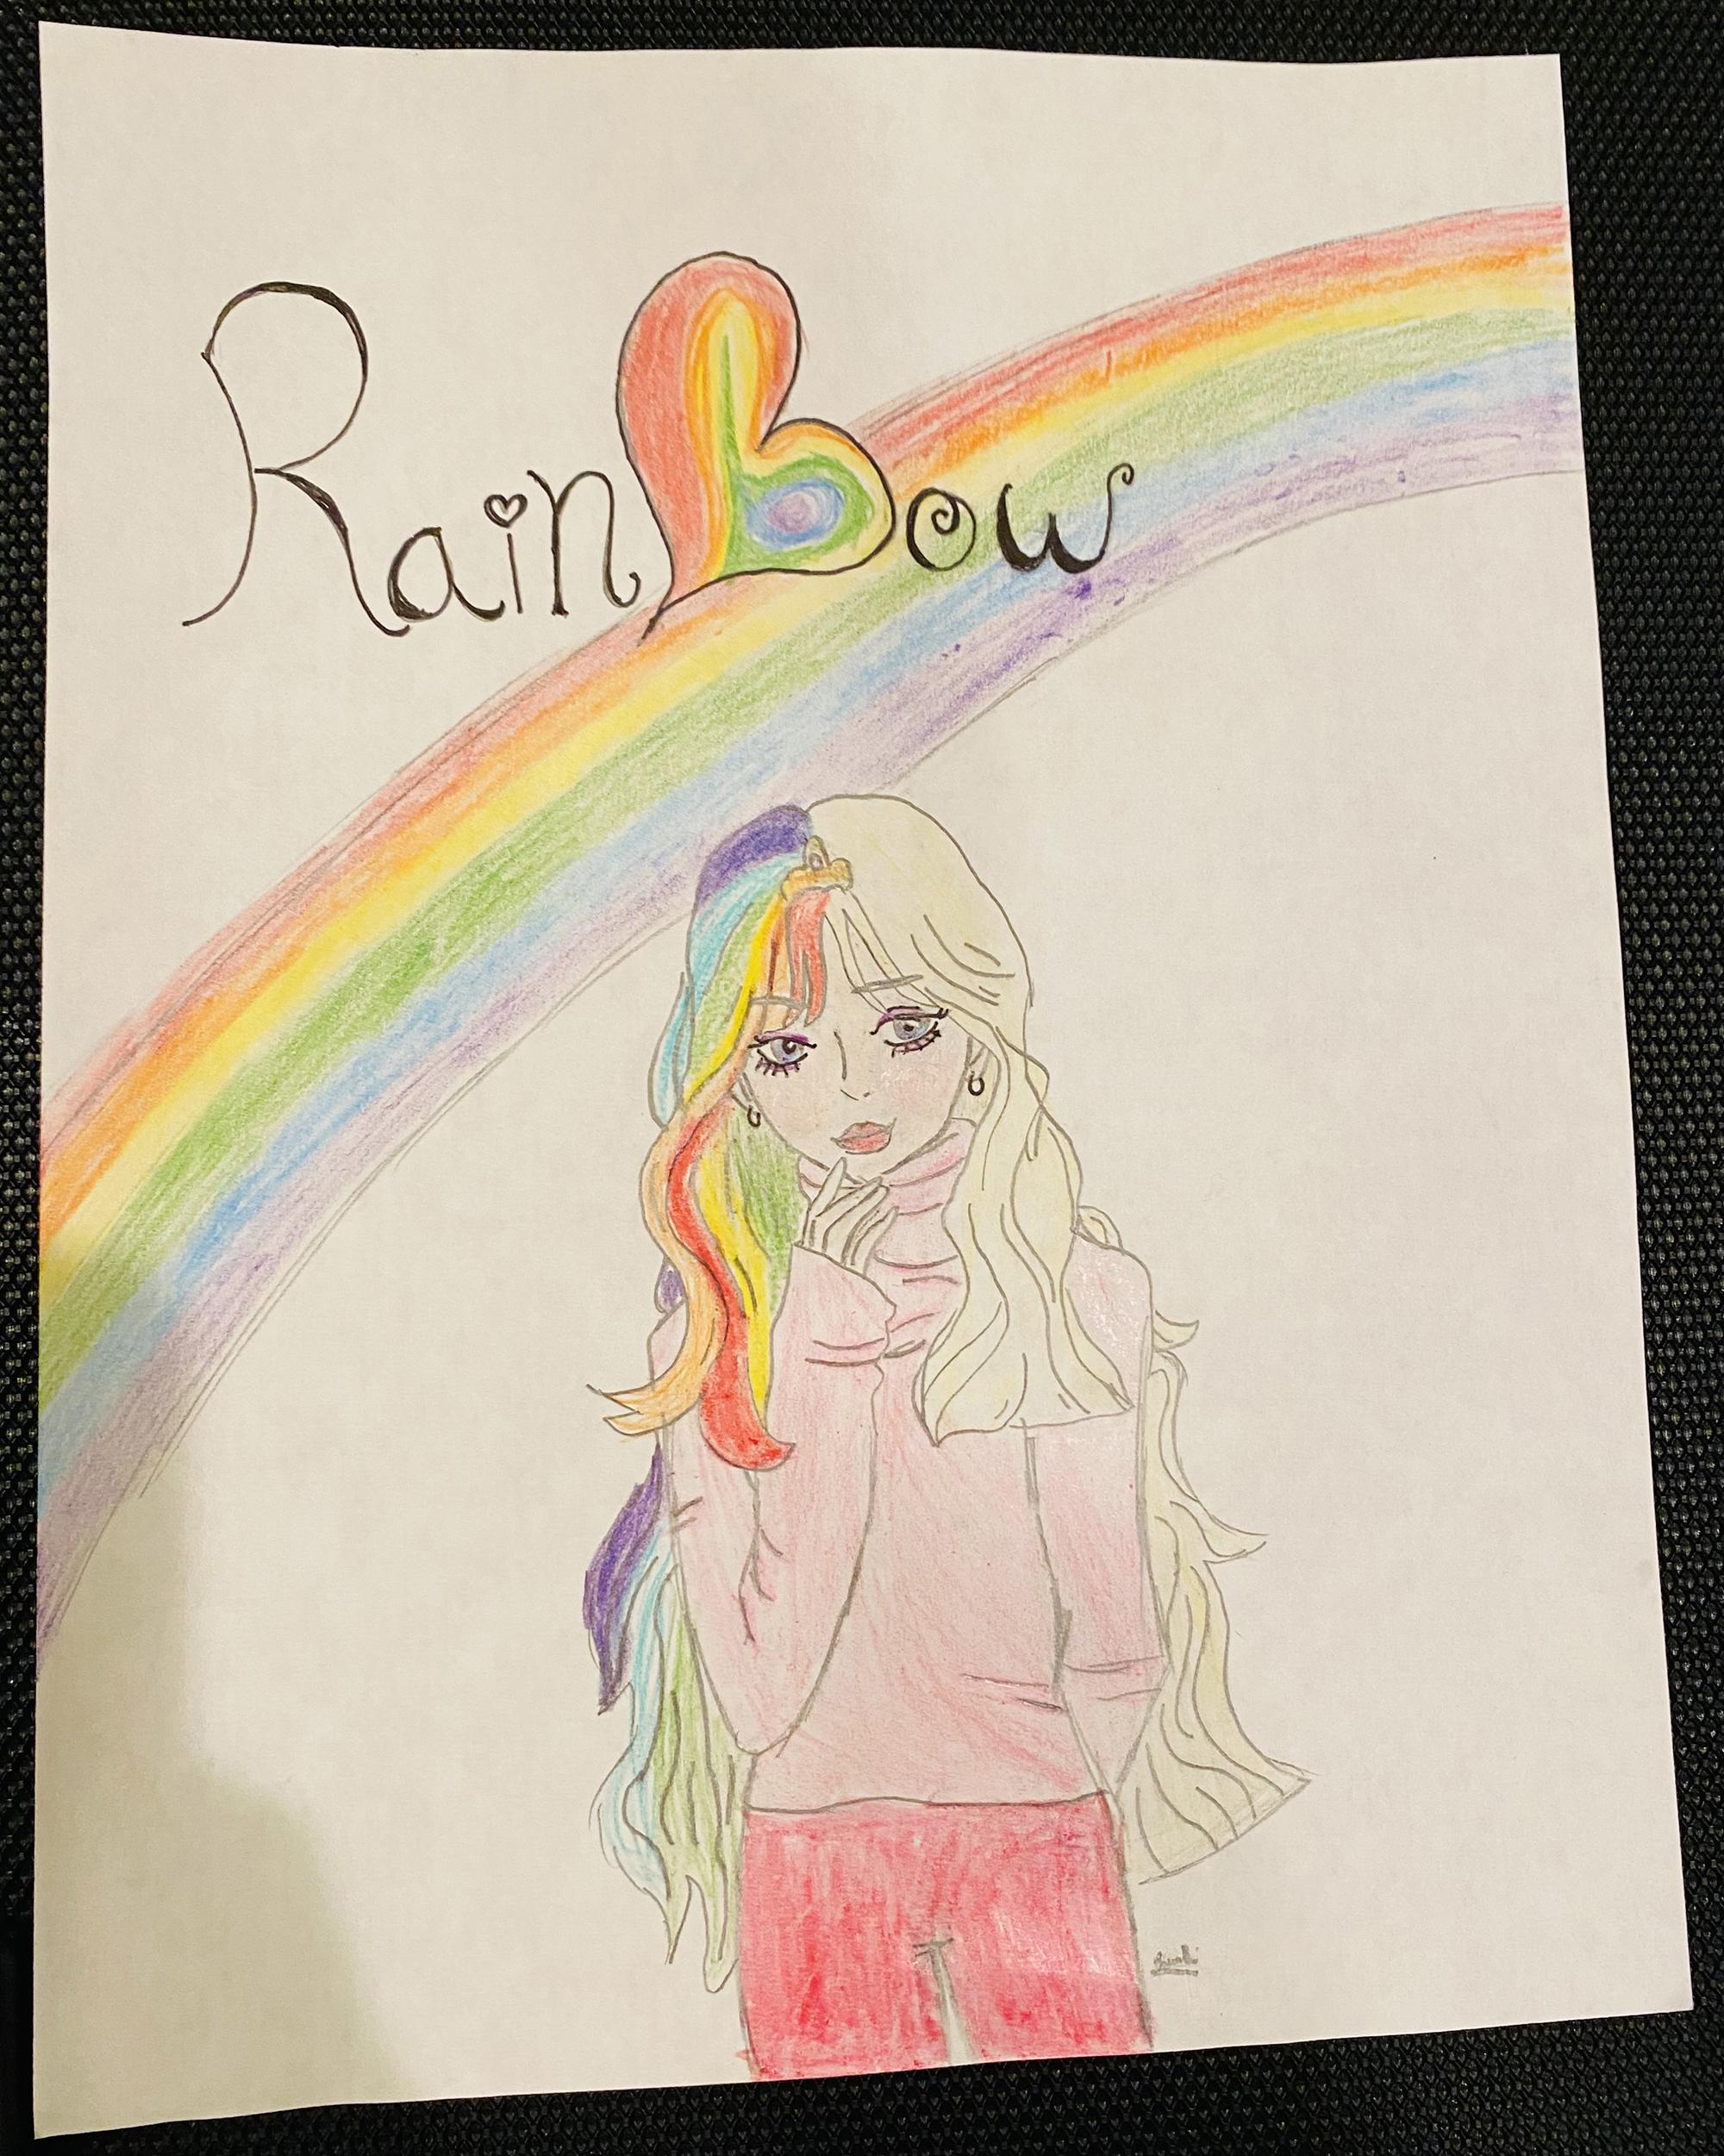 2nd. Lily Borri, Rainbow